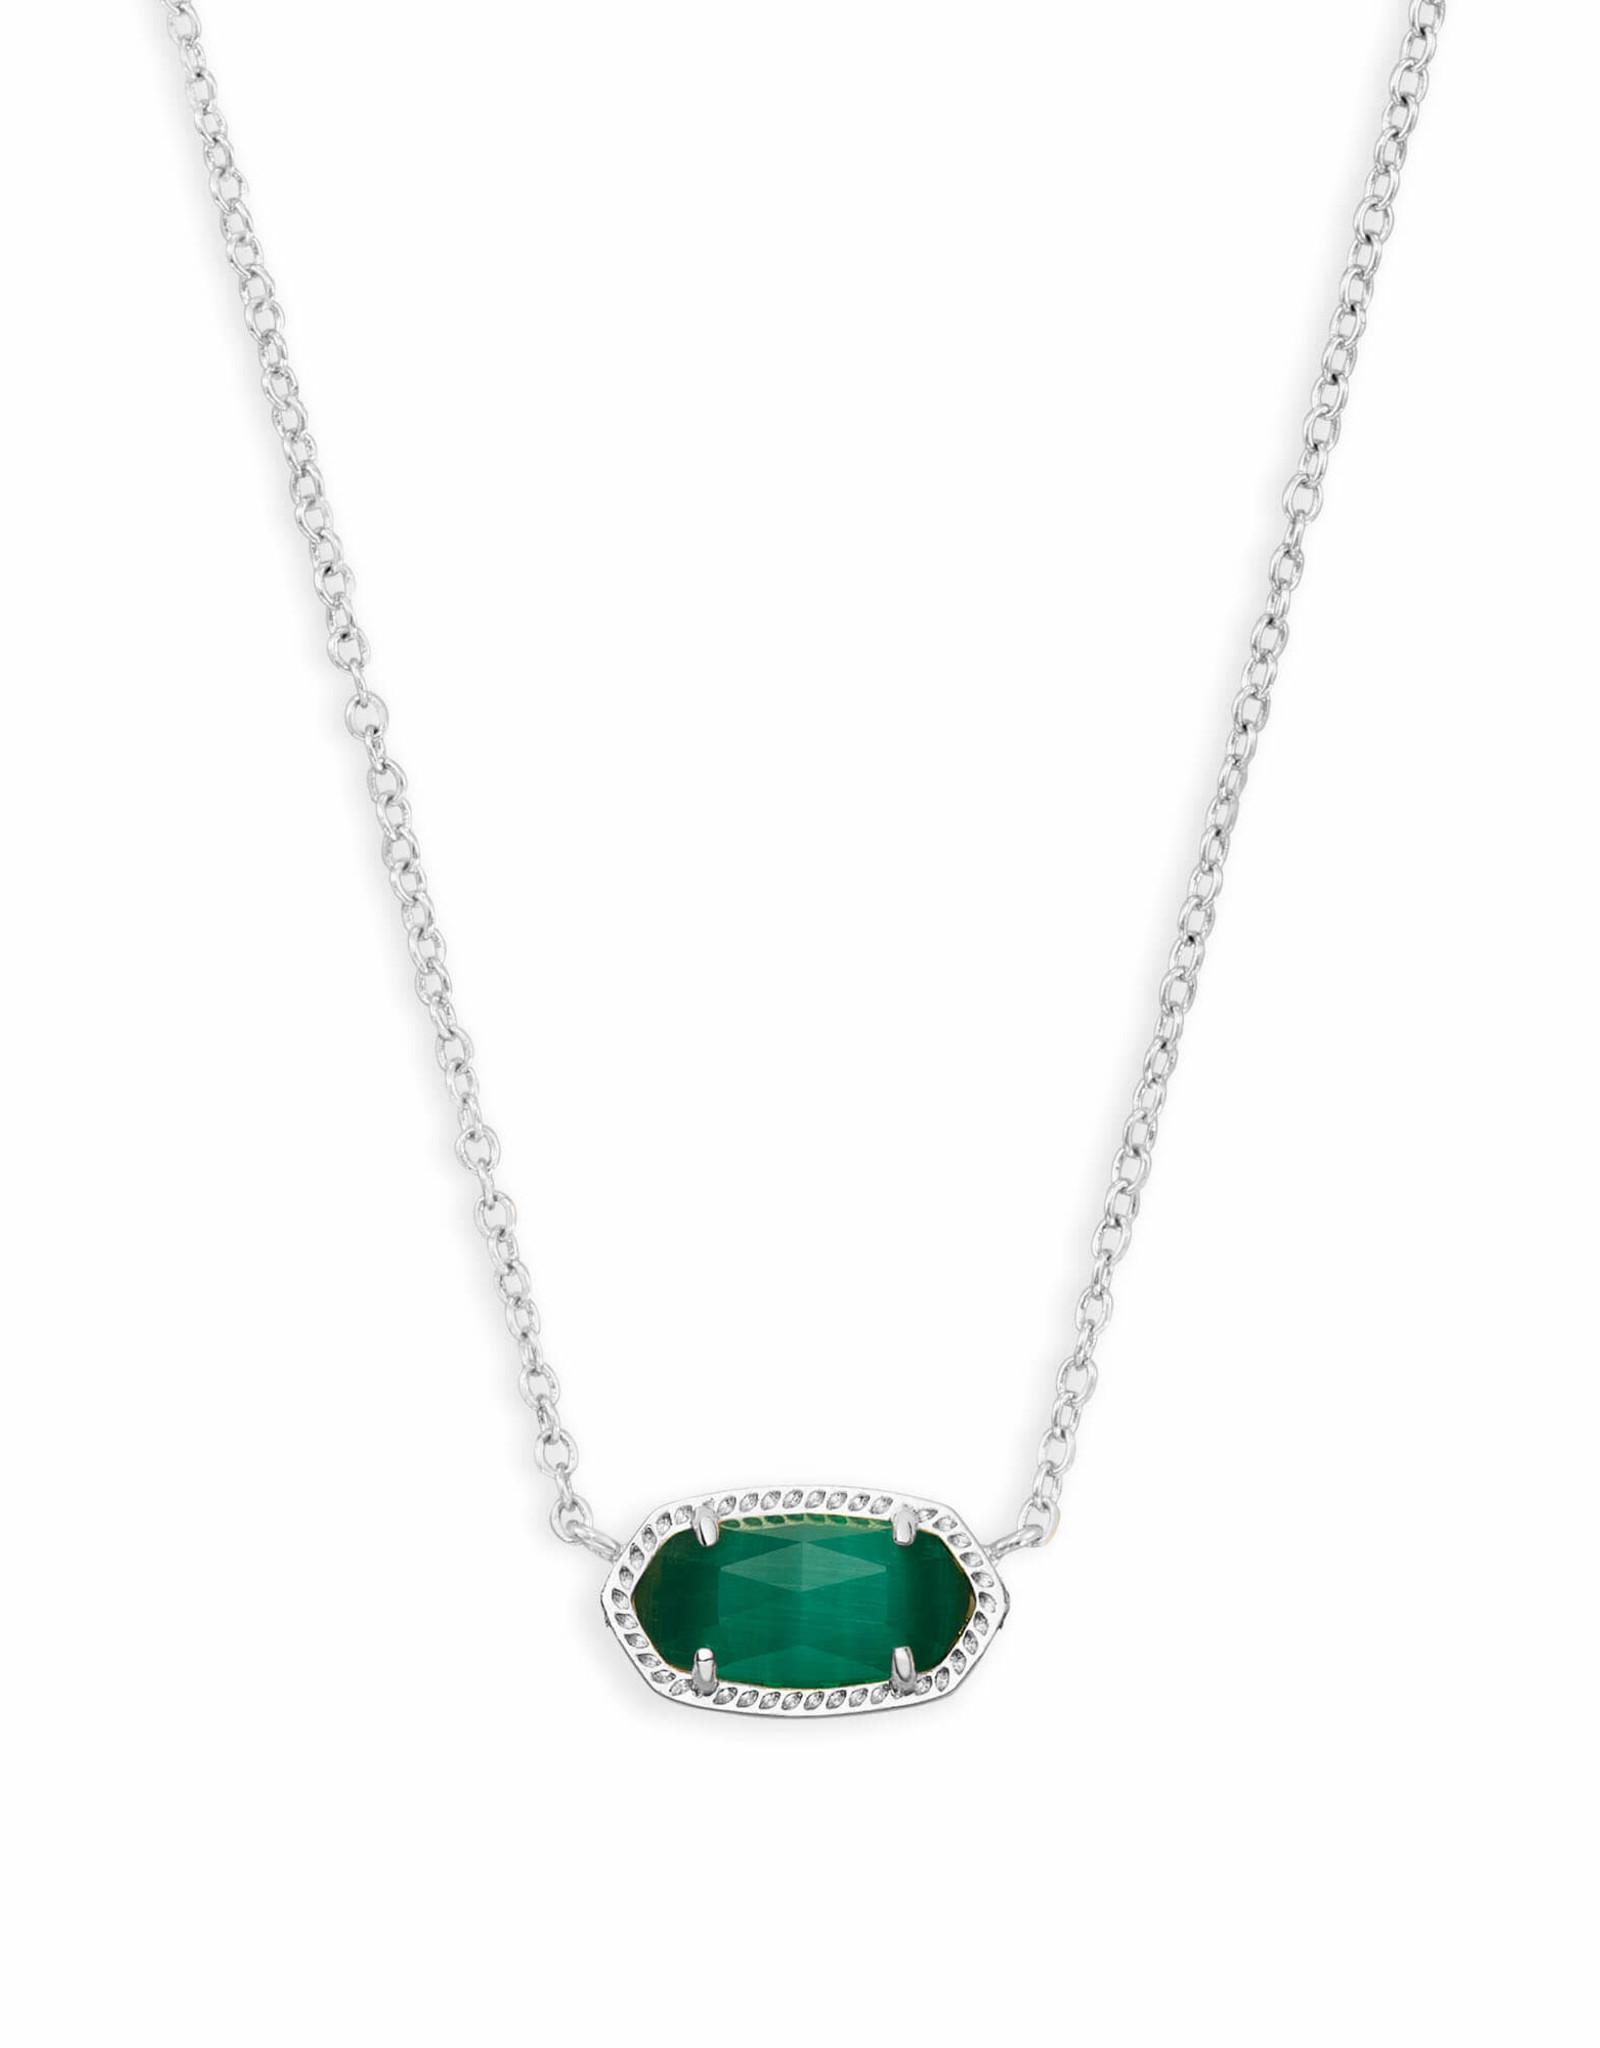 Kendra Scott Elisa Necklace - Emerald Cats Eye/Rhodium